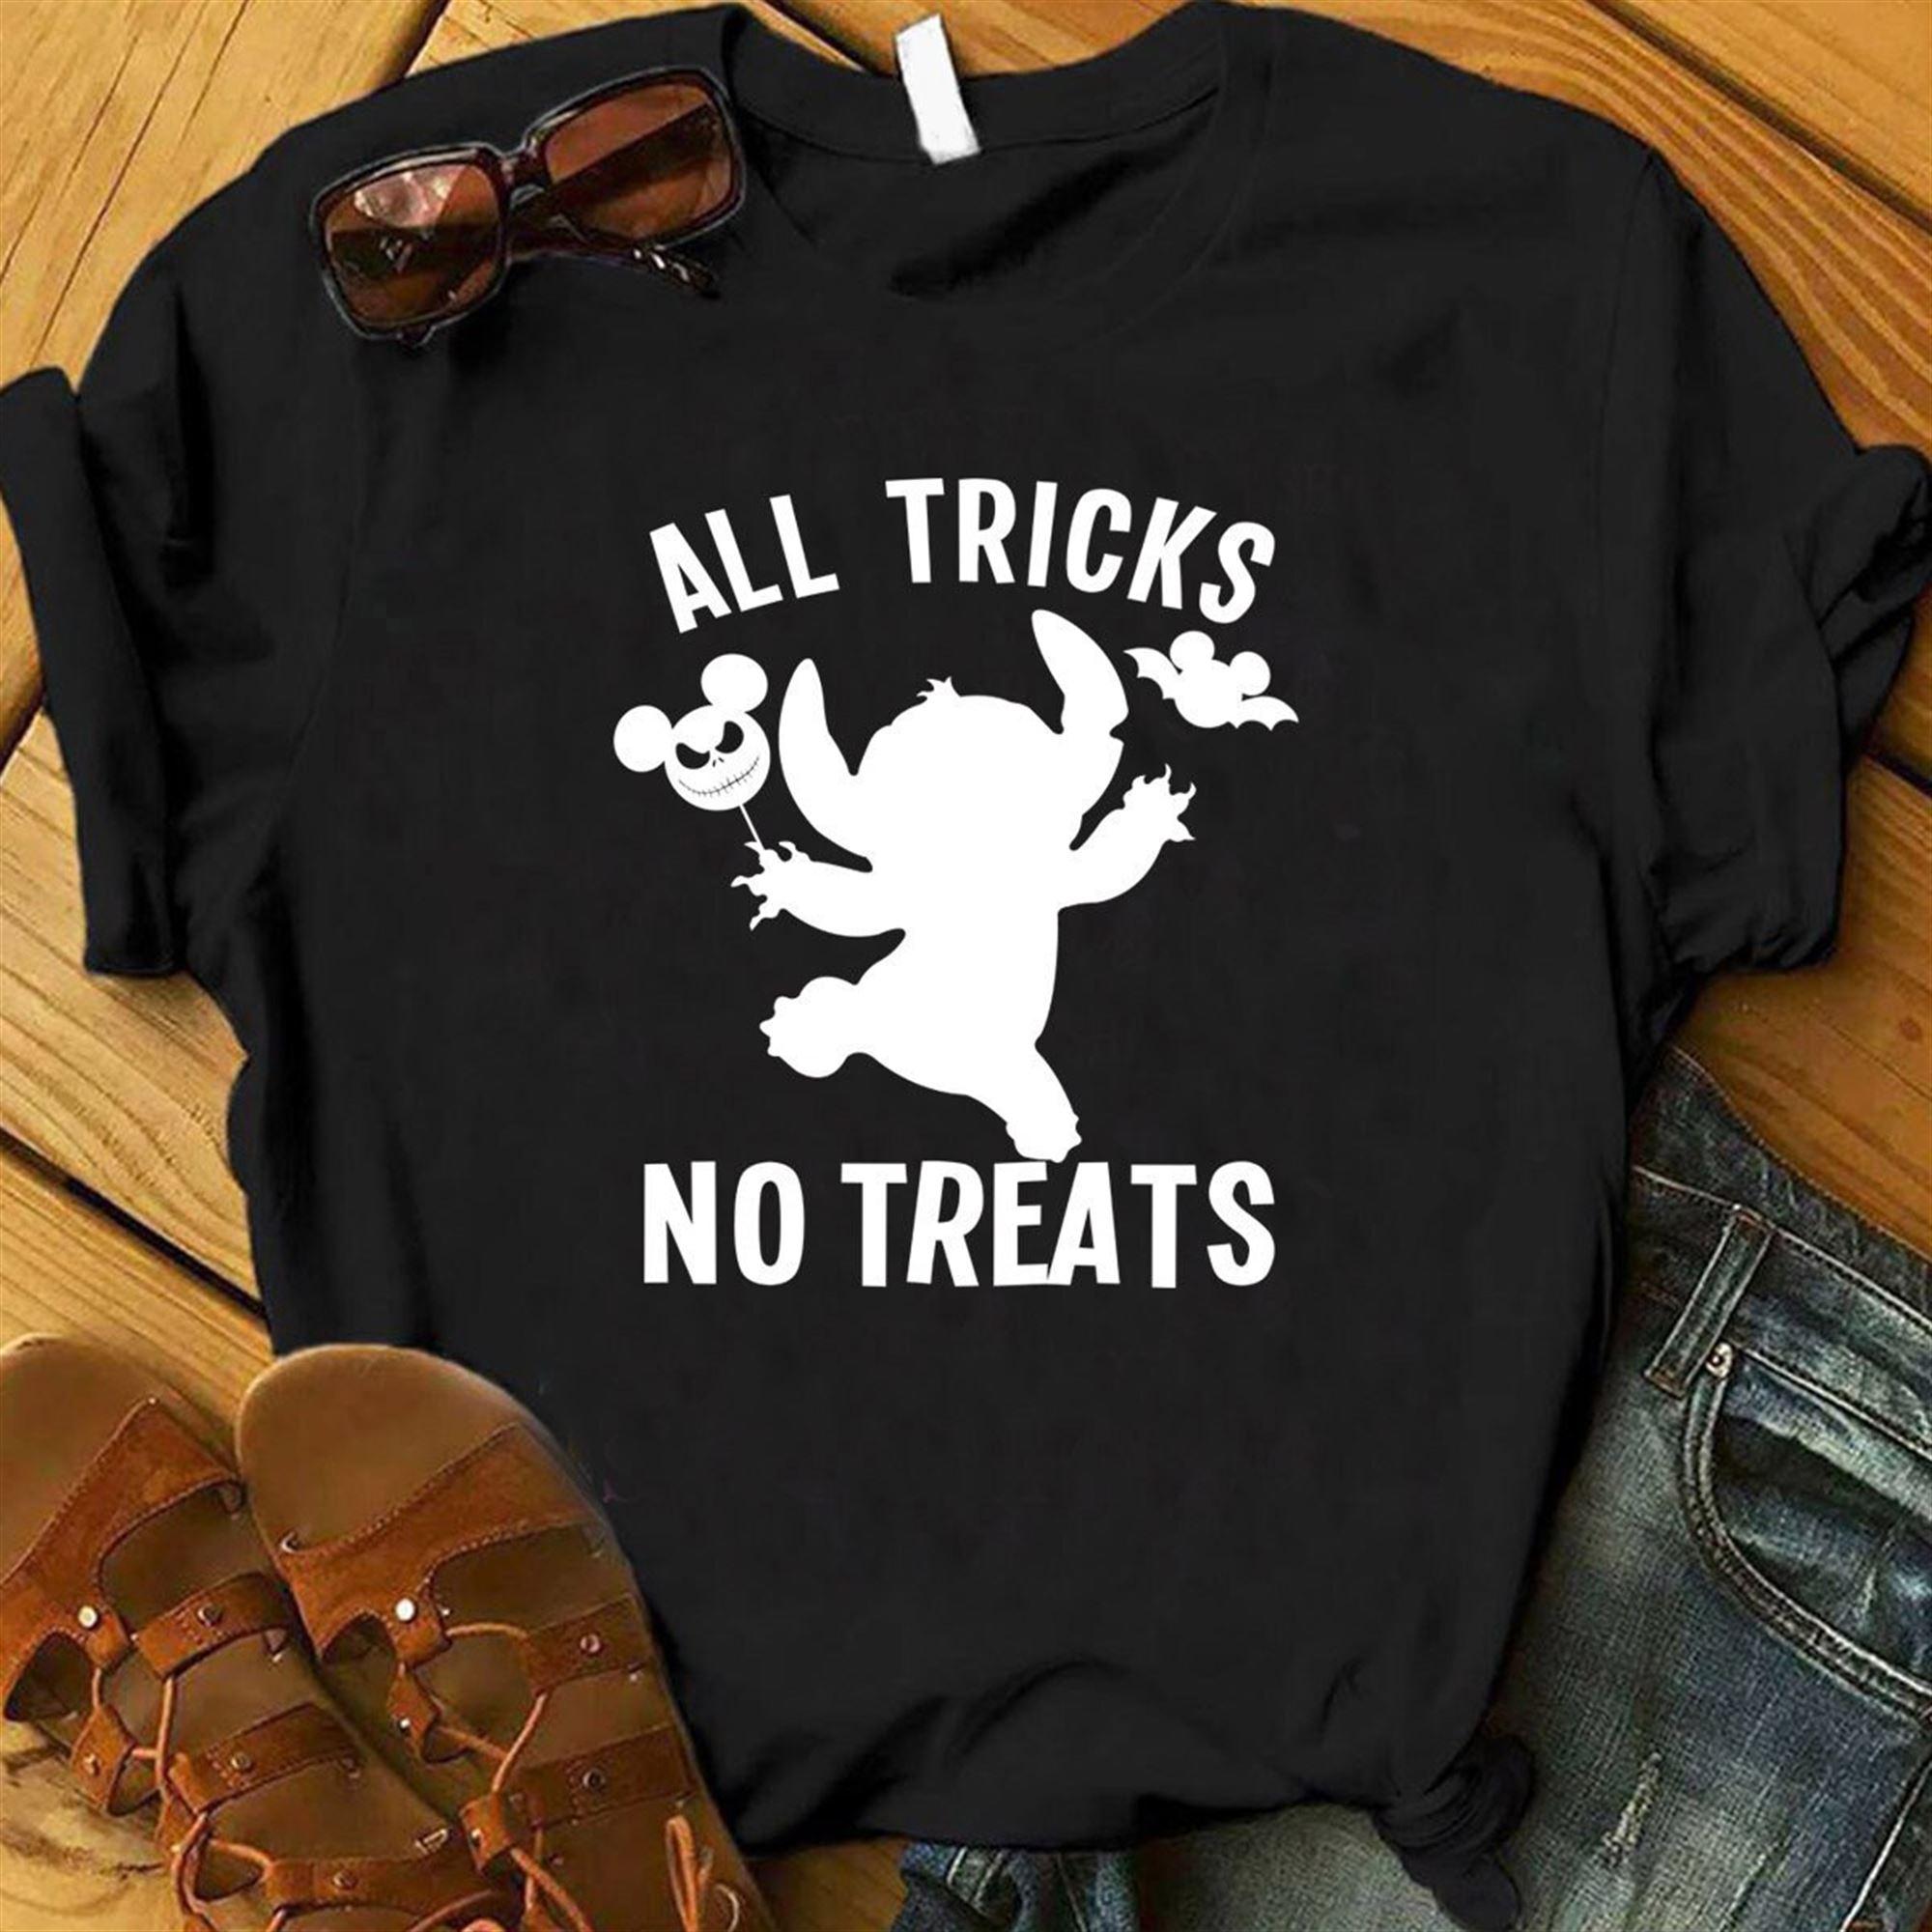 Stitch Shirt Disney Halloween Shirt Disney Shirt Halloween Party Shirt Girls Trip Disney Shirts Disney Family Shirts Halloween Shirt